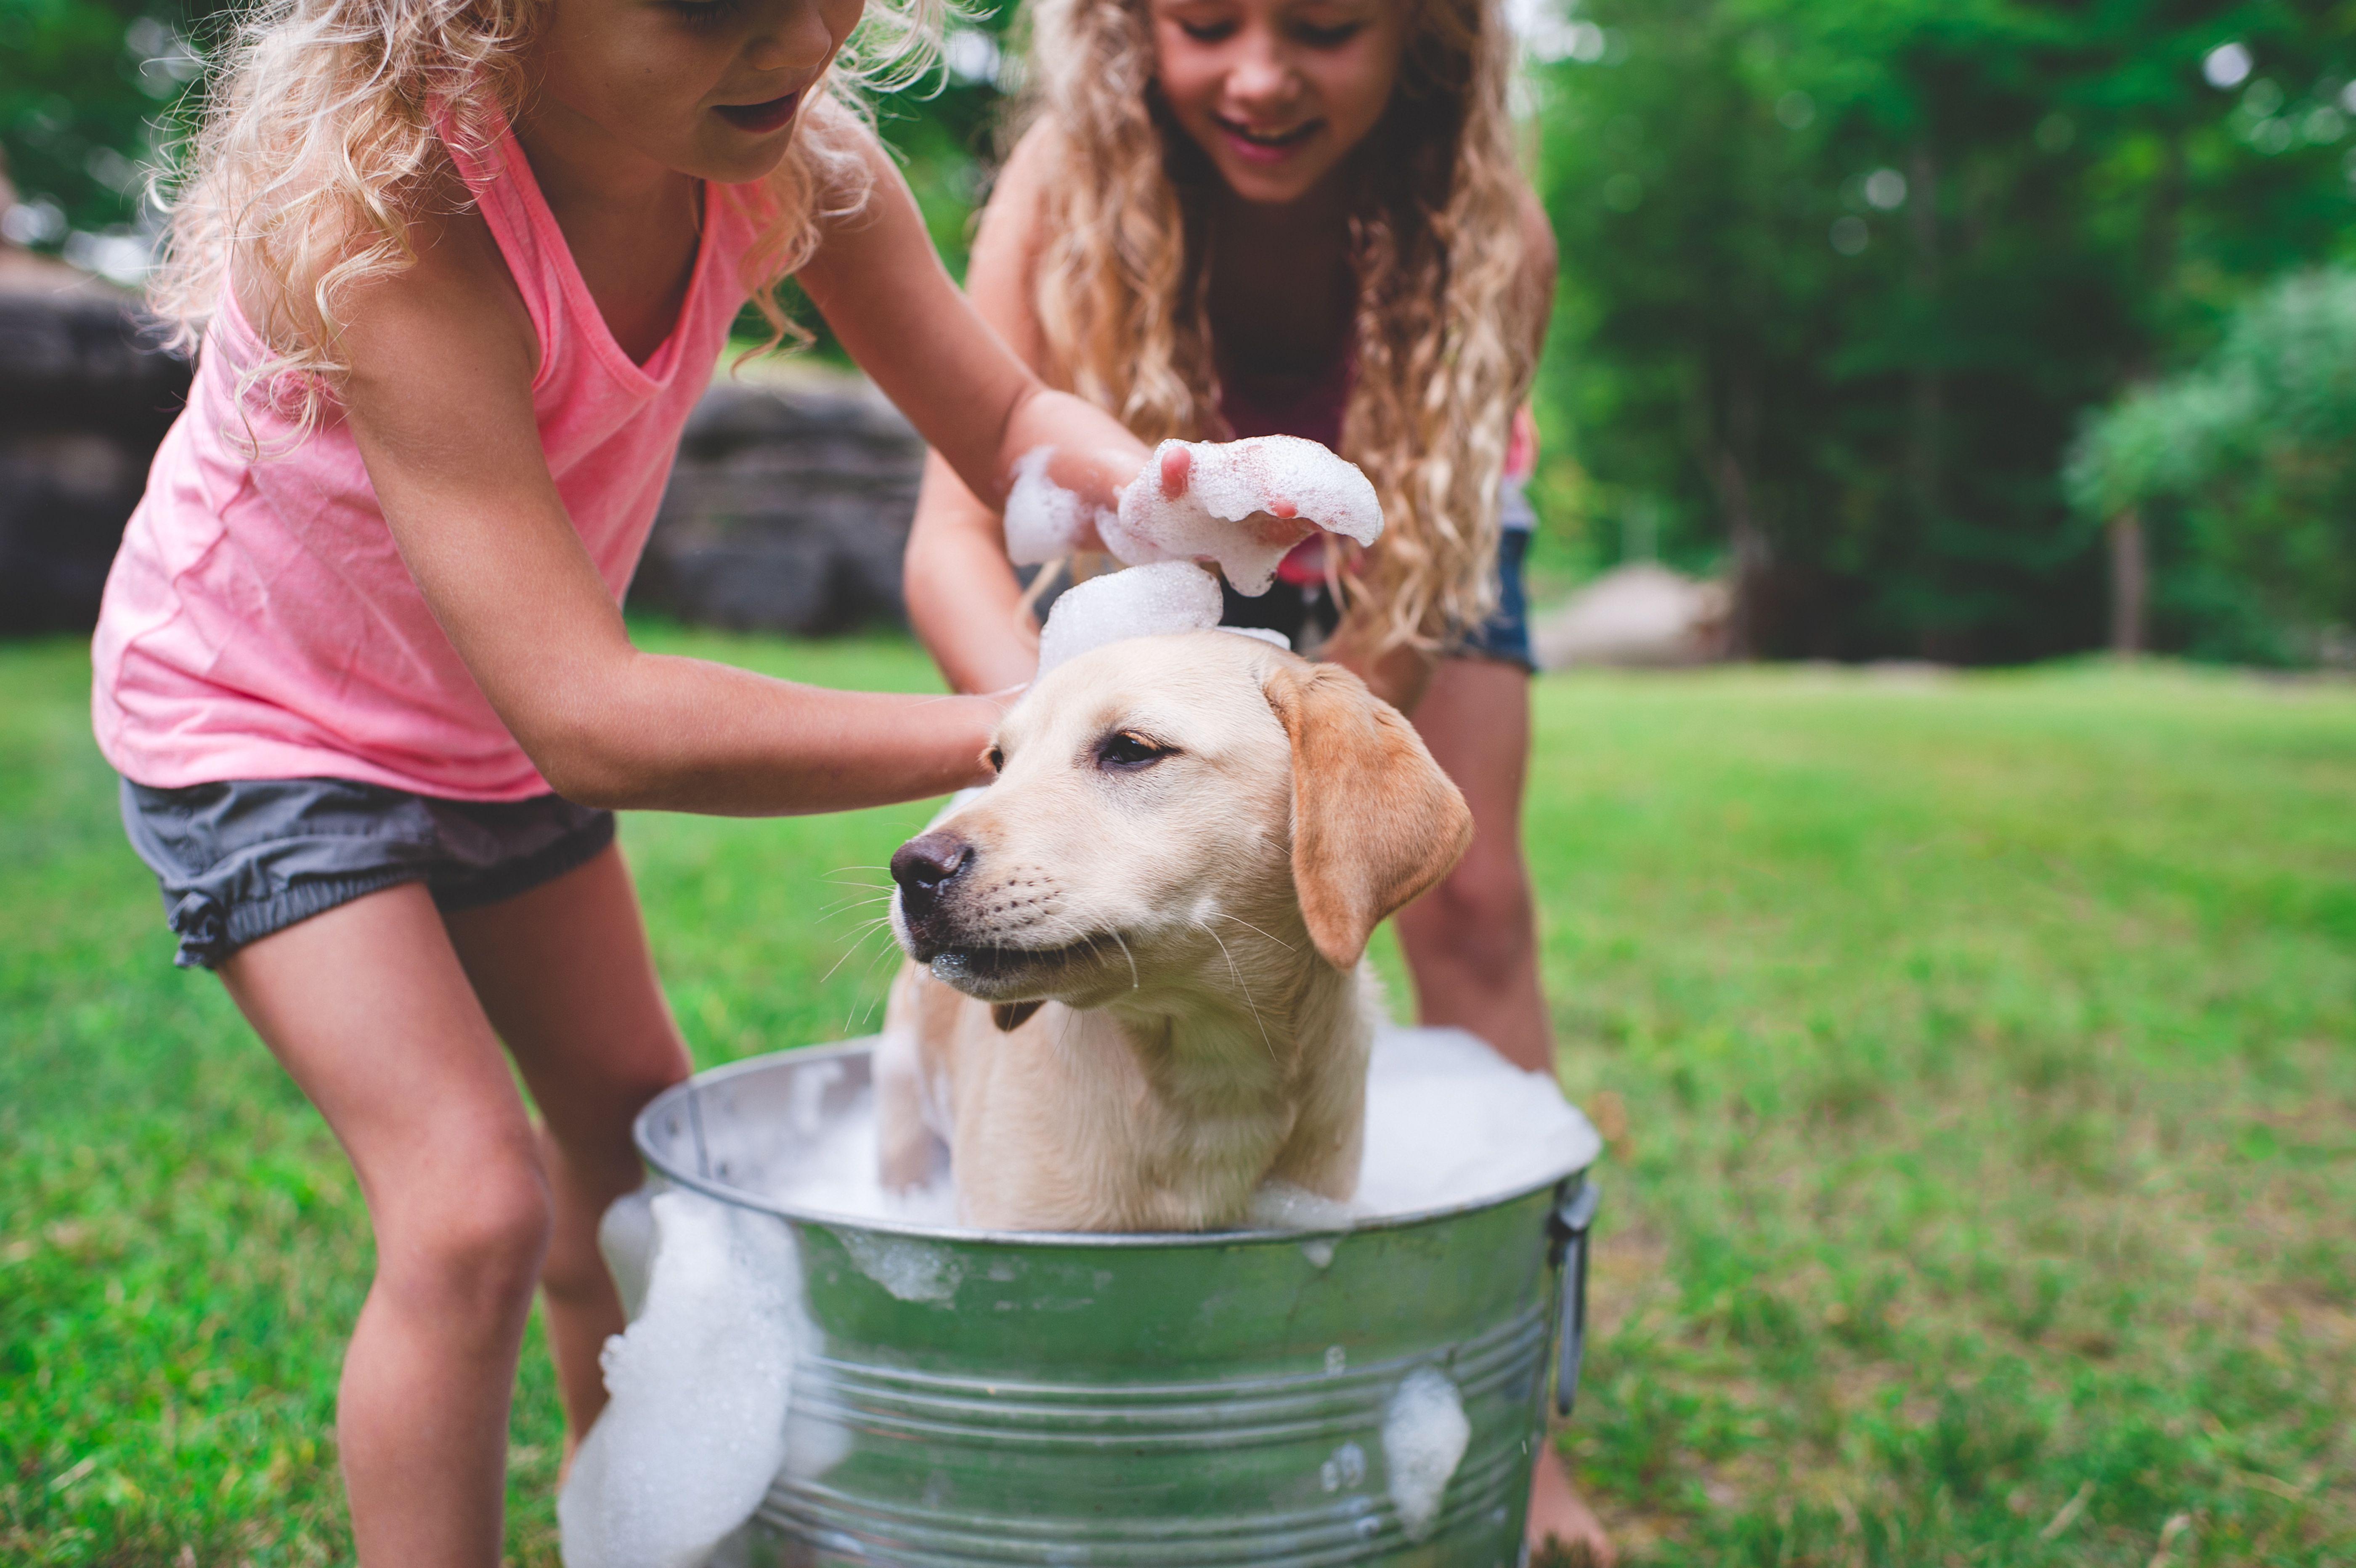 Two sisters bathing pet Labrador retriever puppy